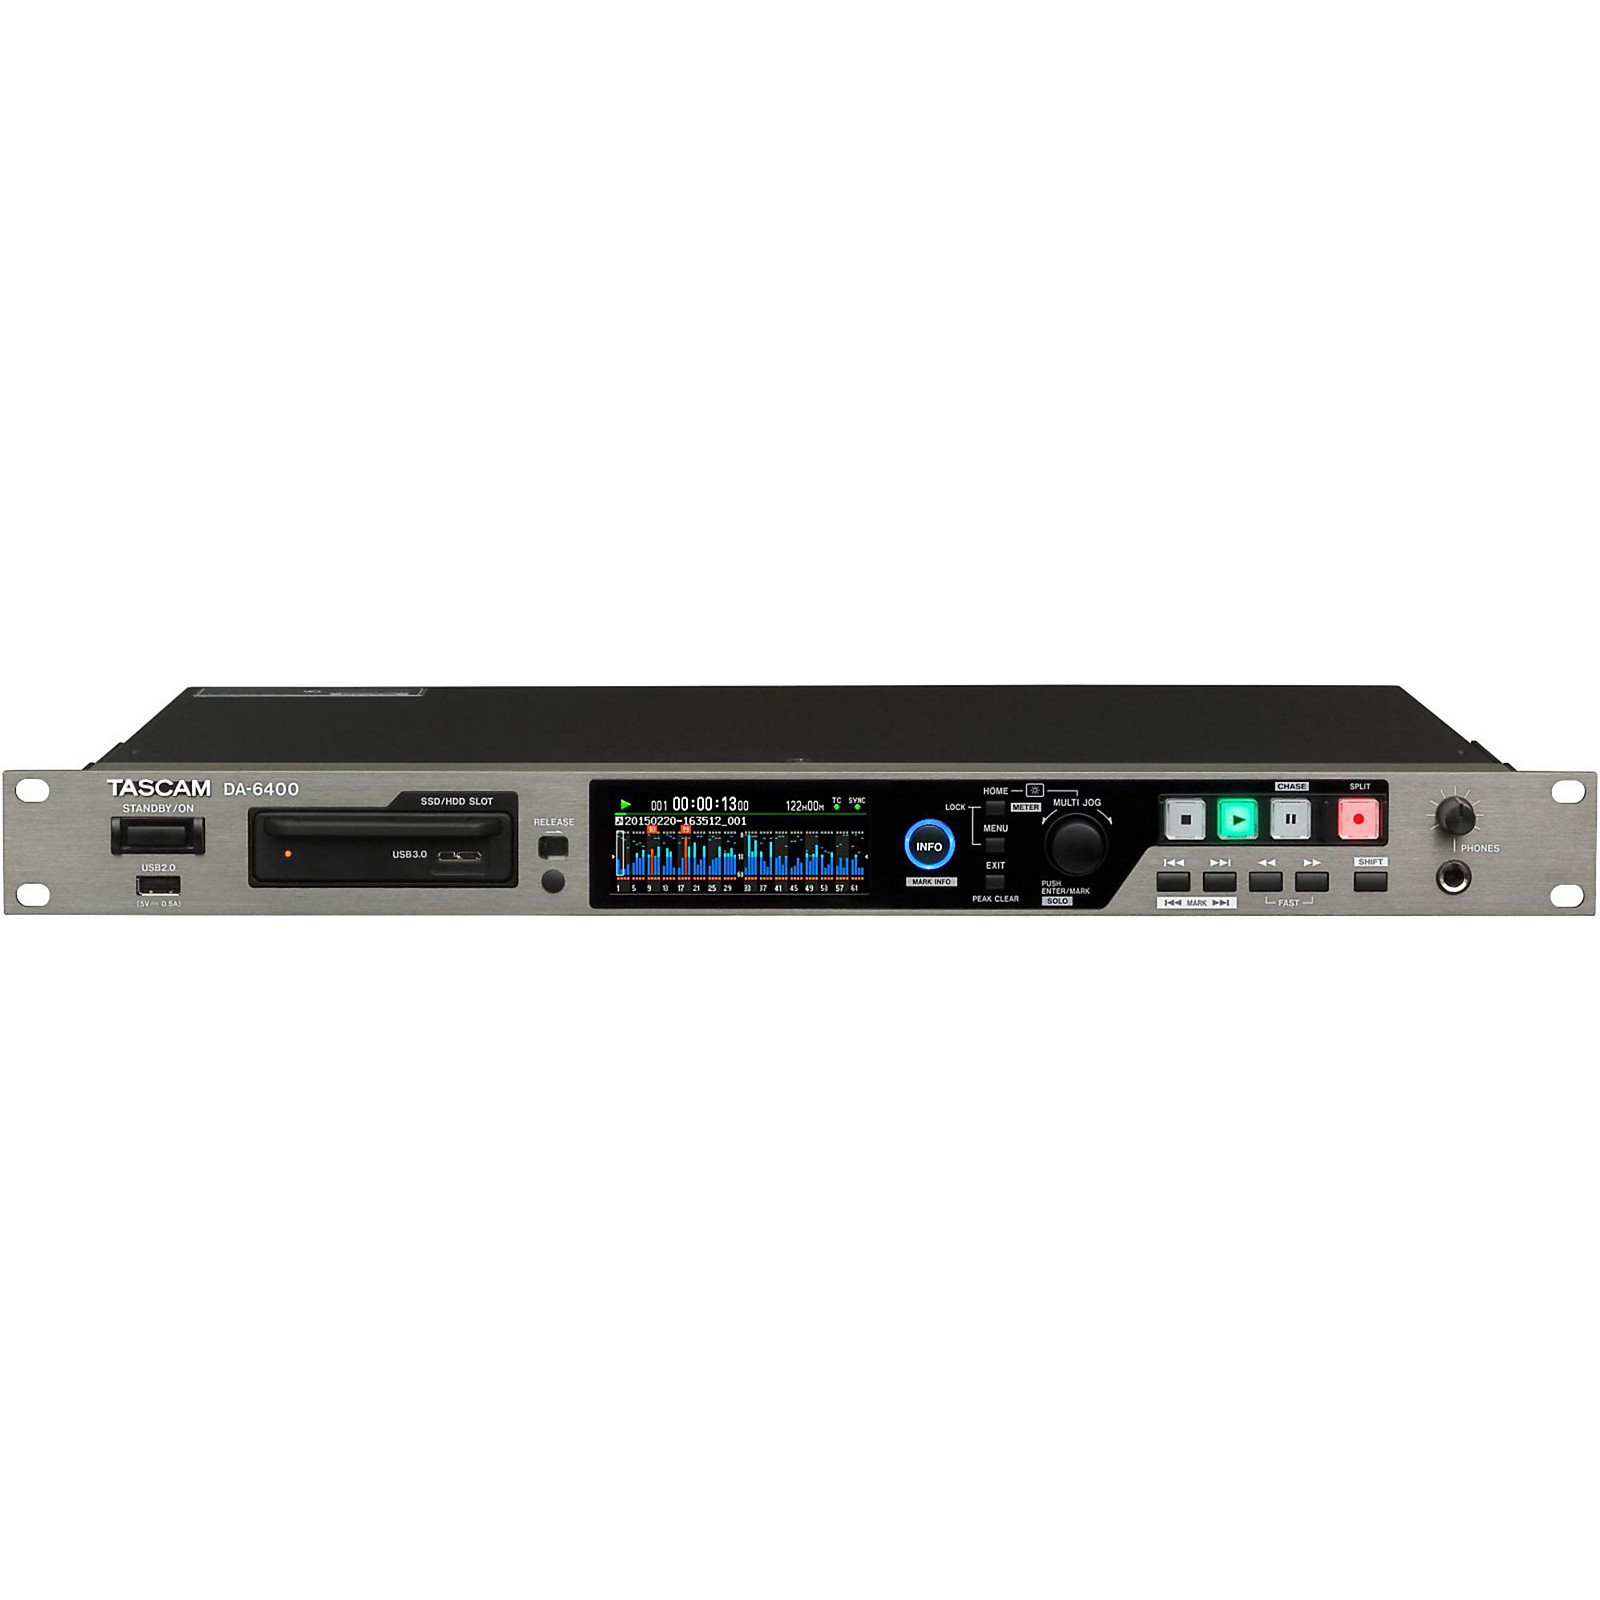 Tascam DA-6400 64-Channel Digital Multitrack Recorder